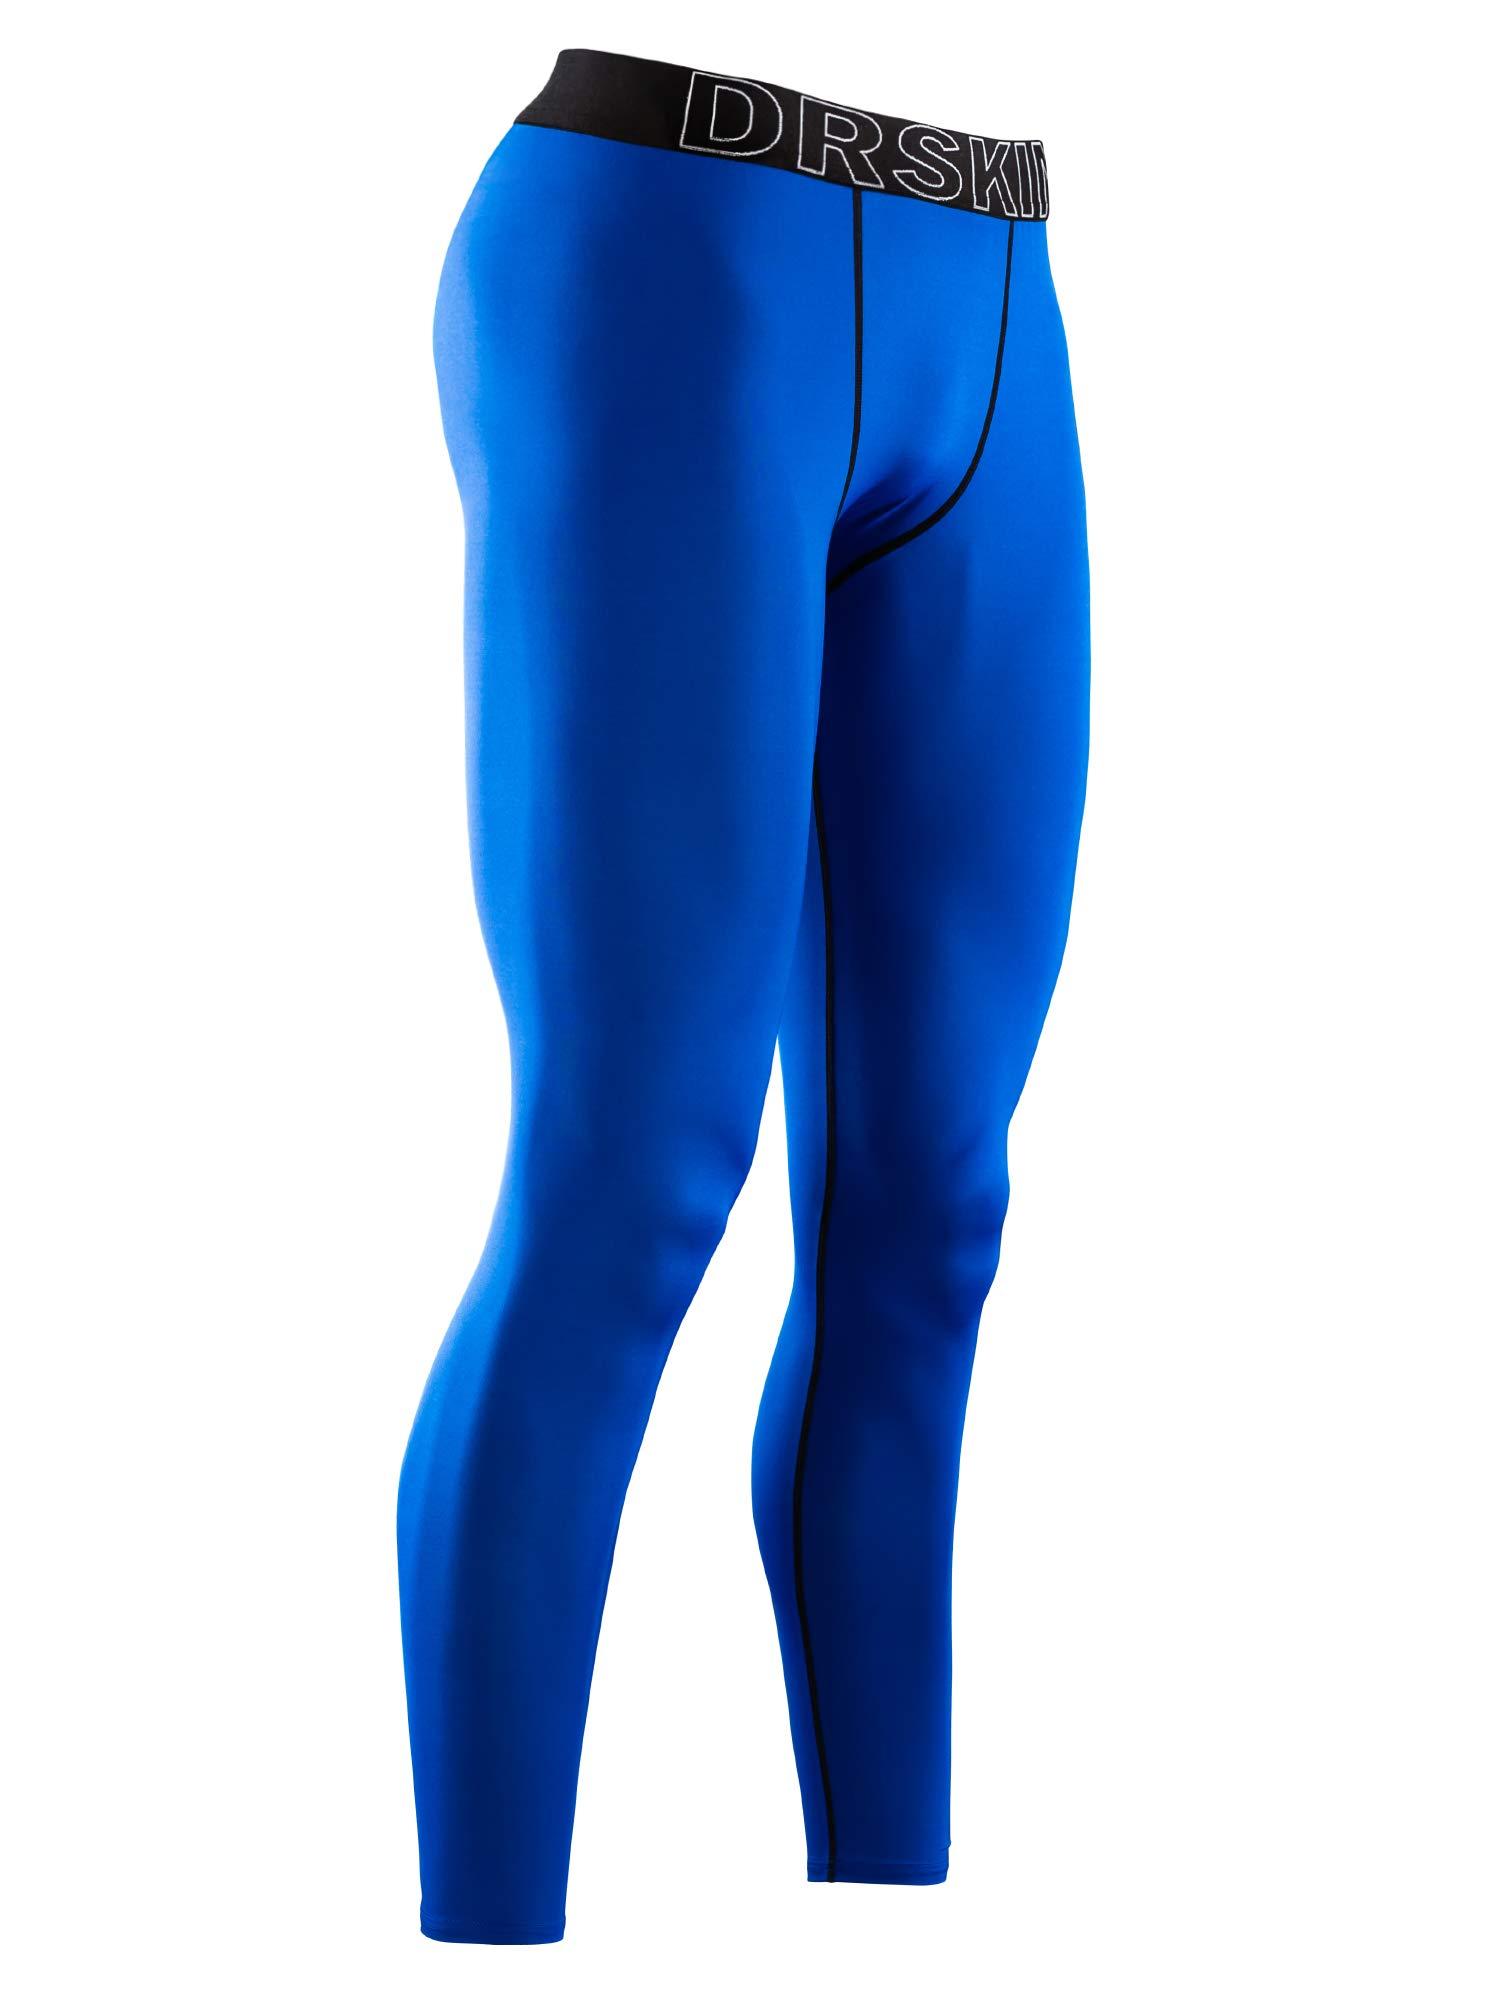 DRSKIN Men's Compression Warm Dry Cool Sports